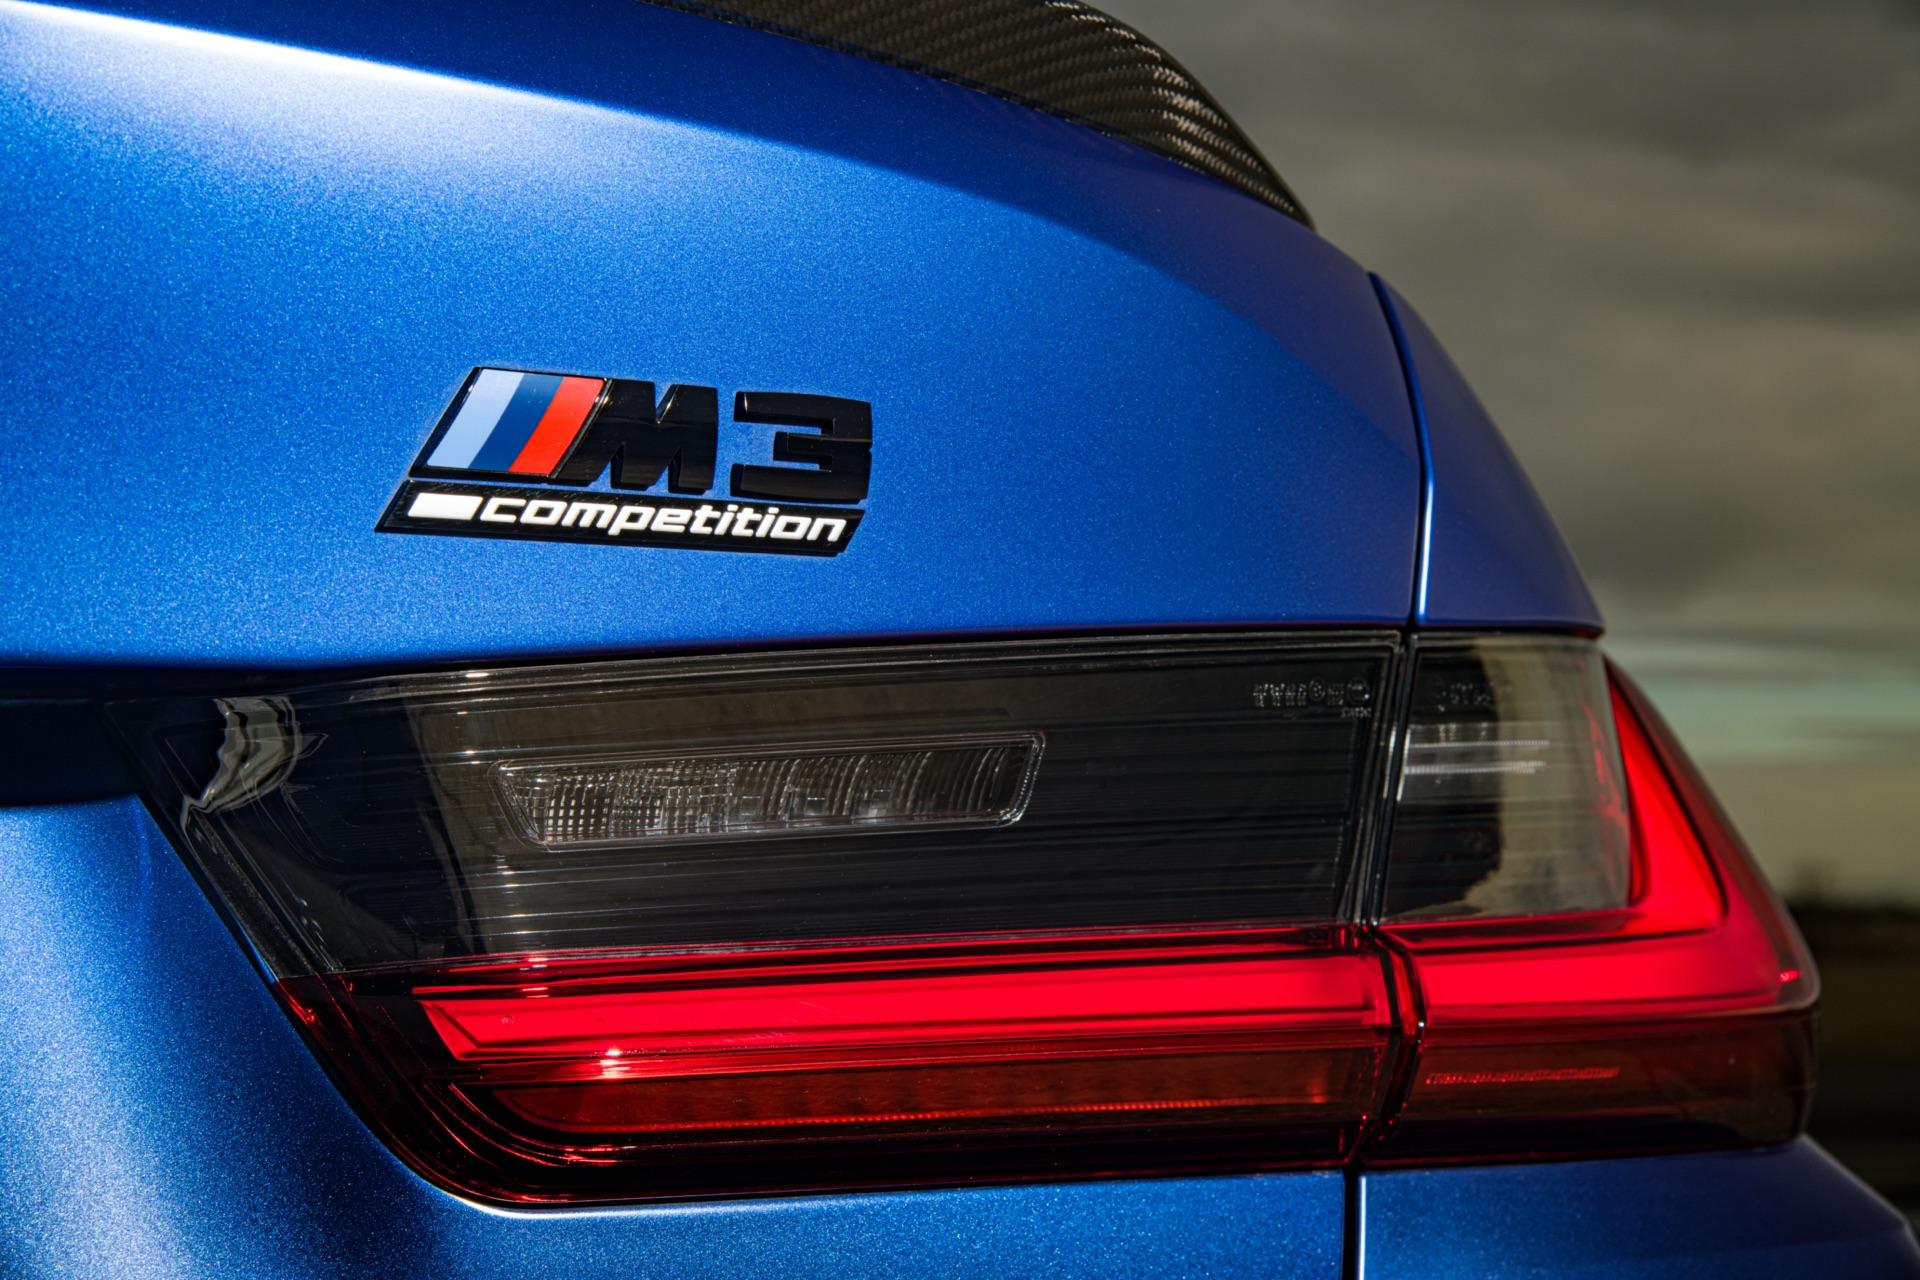 2022 BMW M3 rear badge